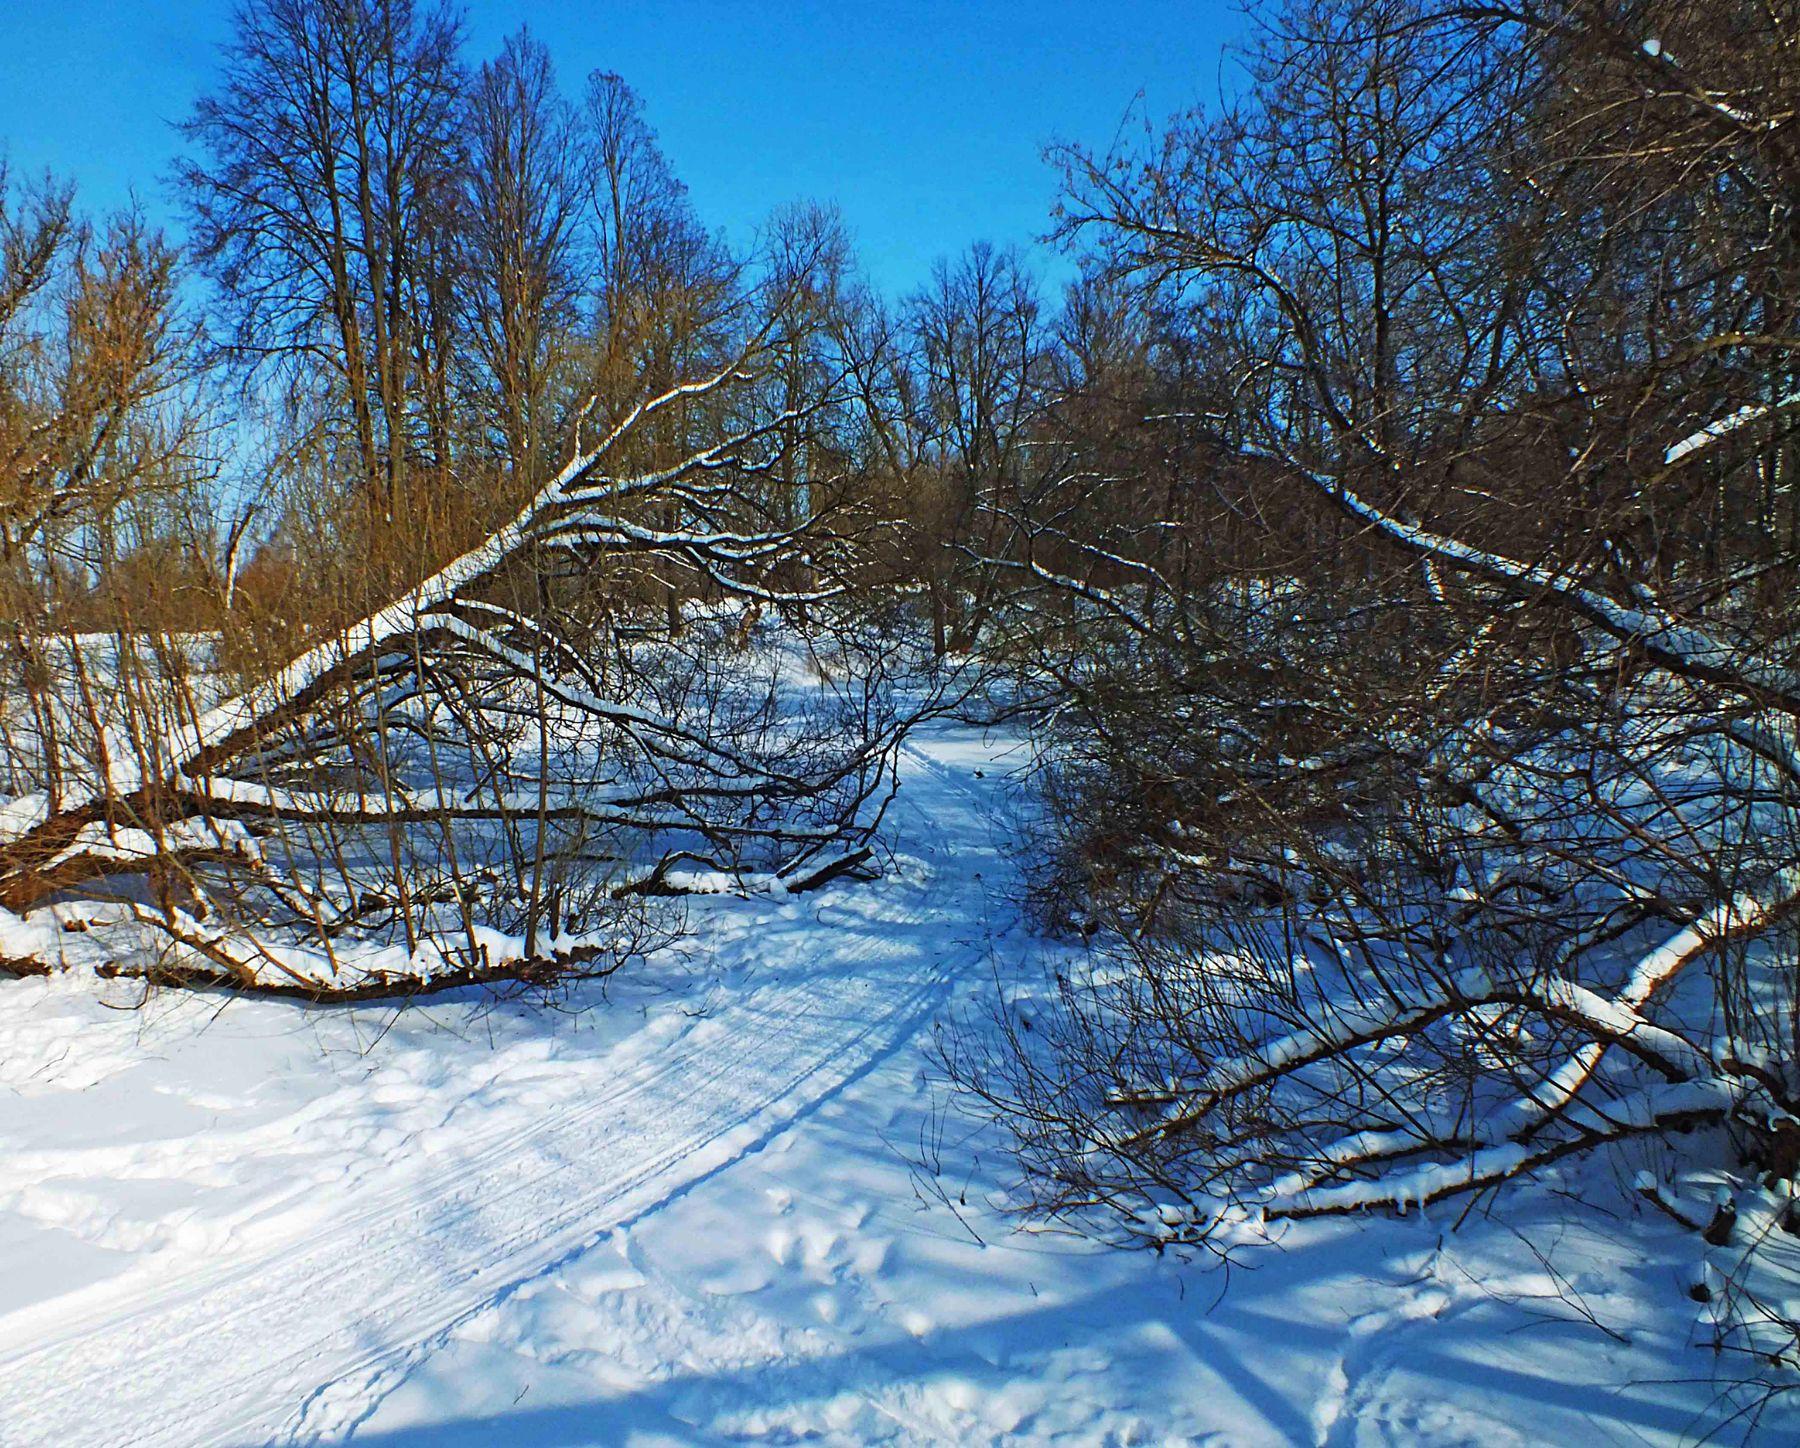 Дорога в дебри зима снег мороз Баташи